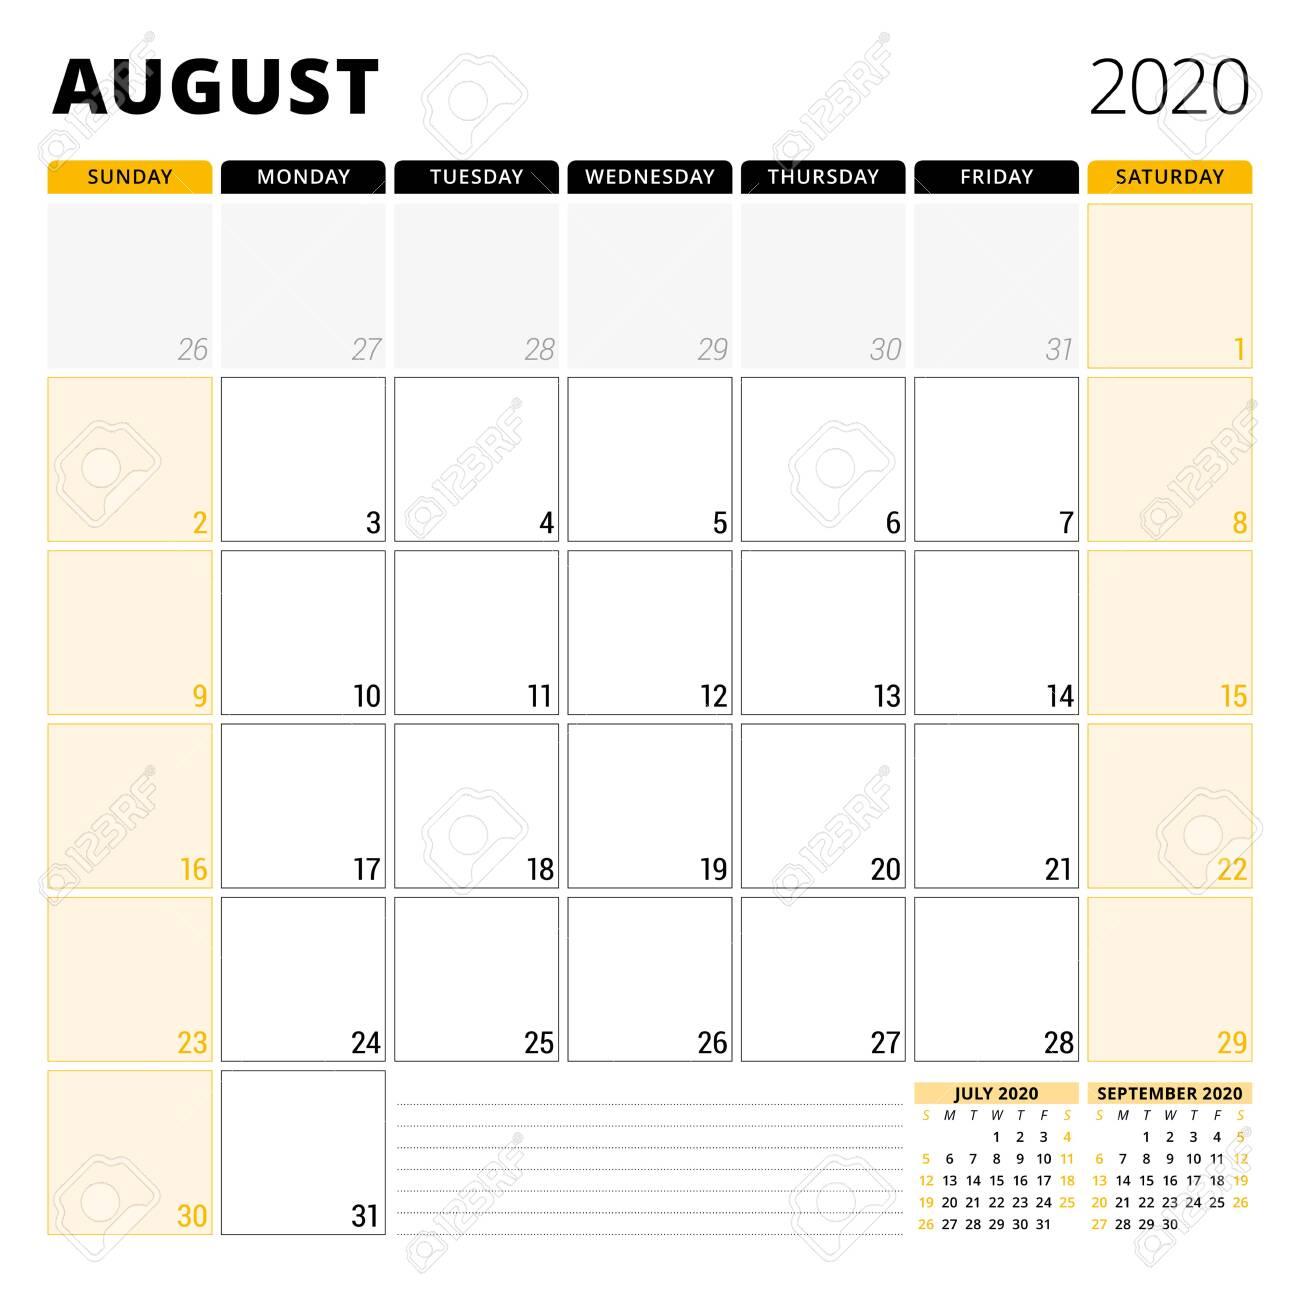 Calendar planner for August 2020  Stationery design template